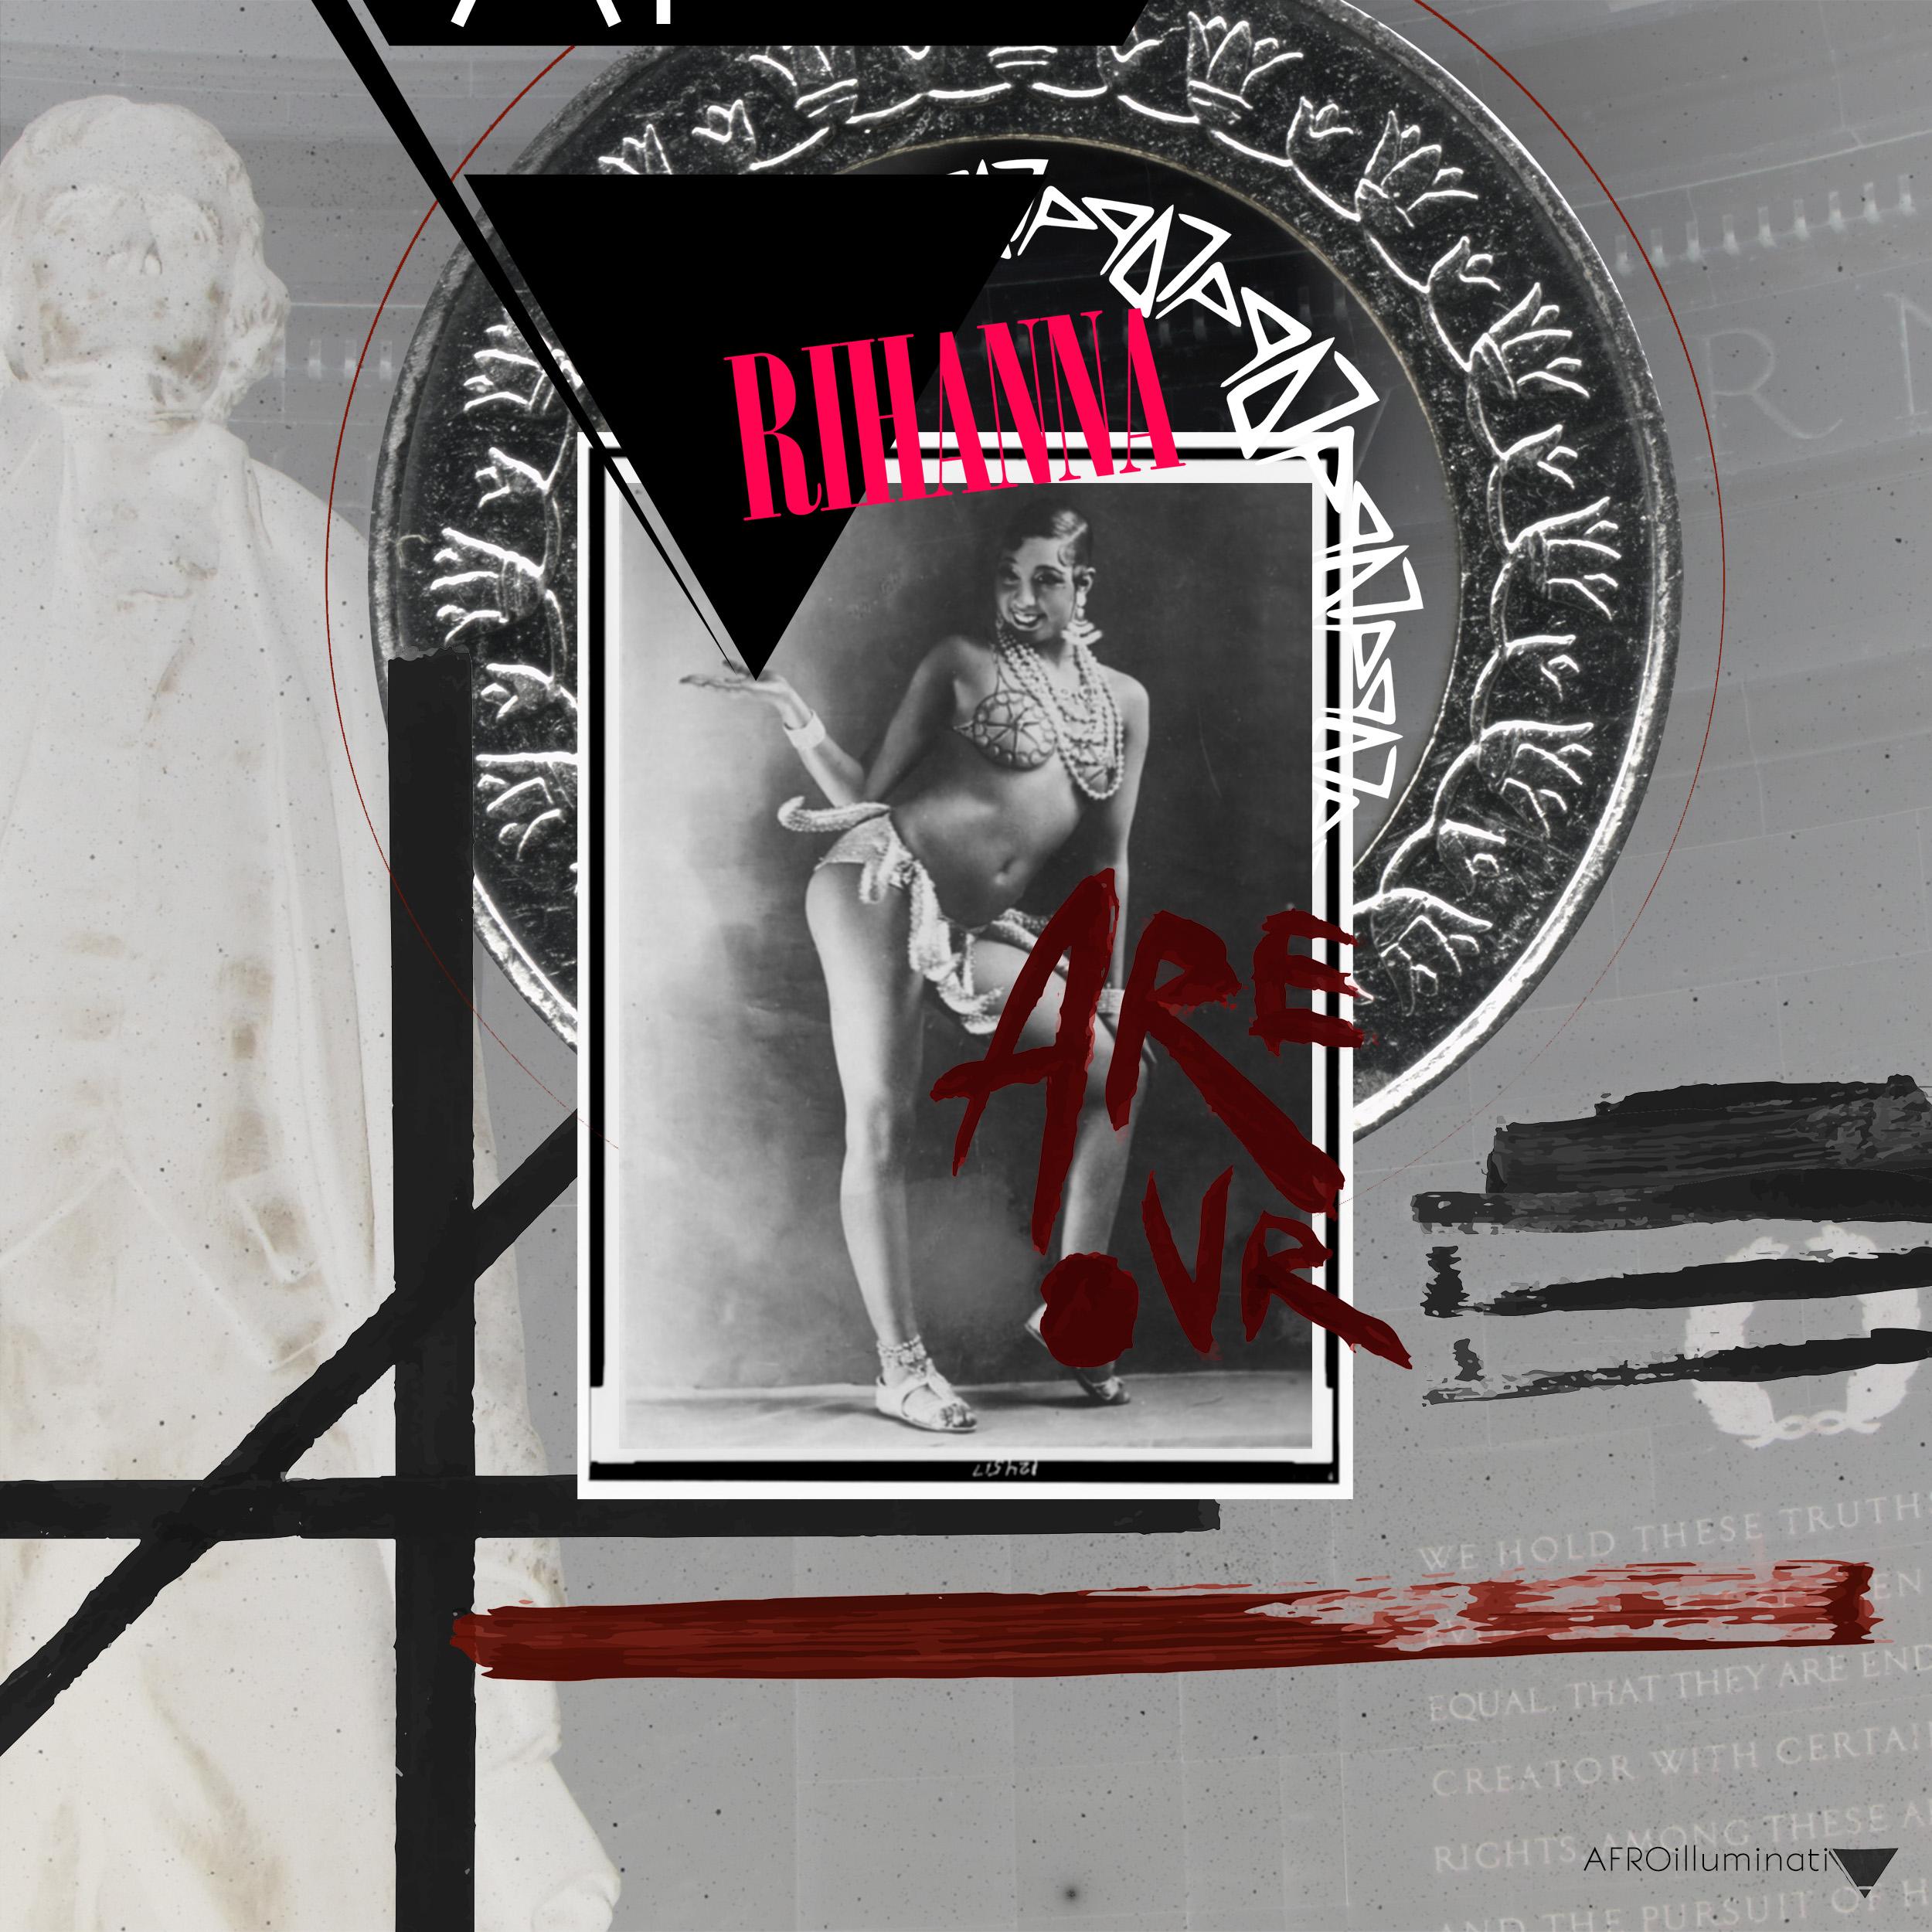 SATURDAY NIGHT SPECIAL 3 AI Josephine Baker RHIANNA and JEFFERSON.jpg